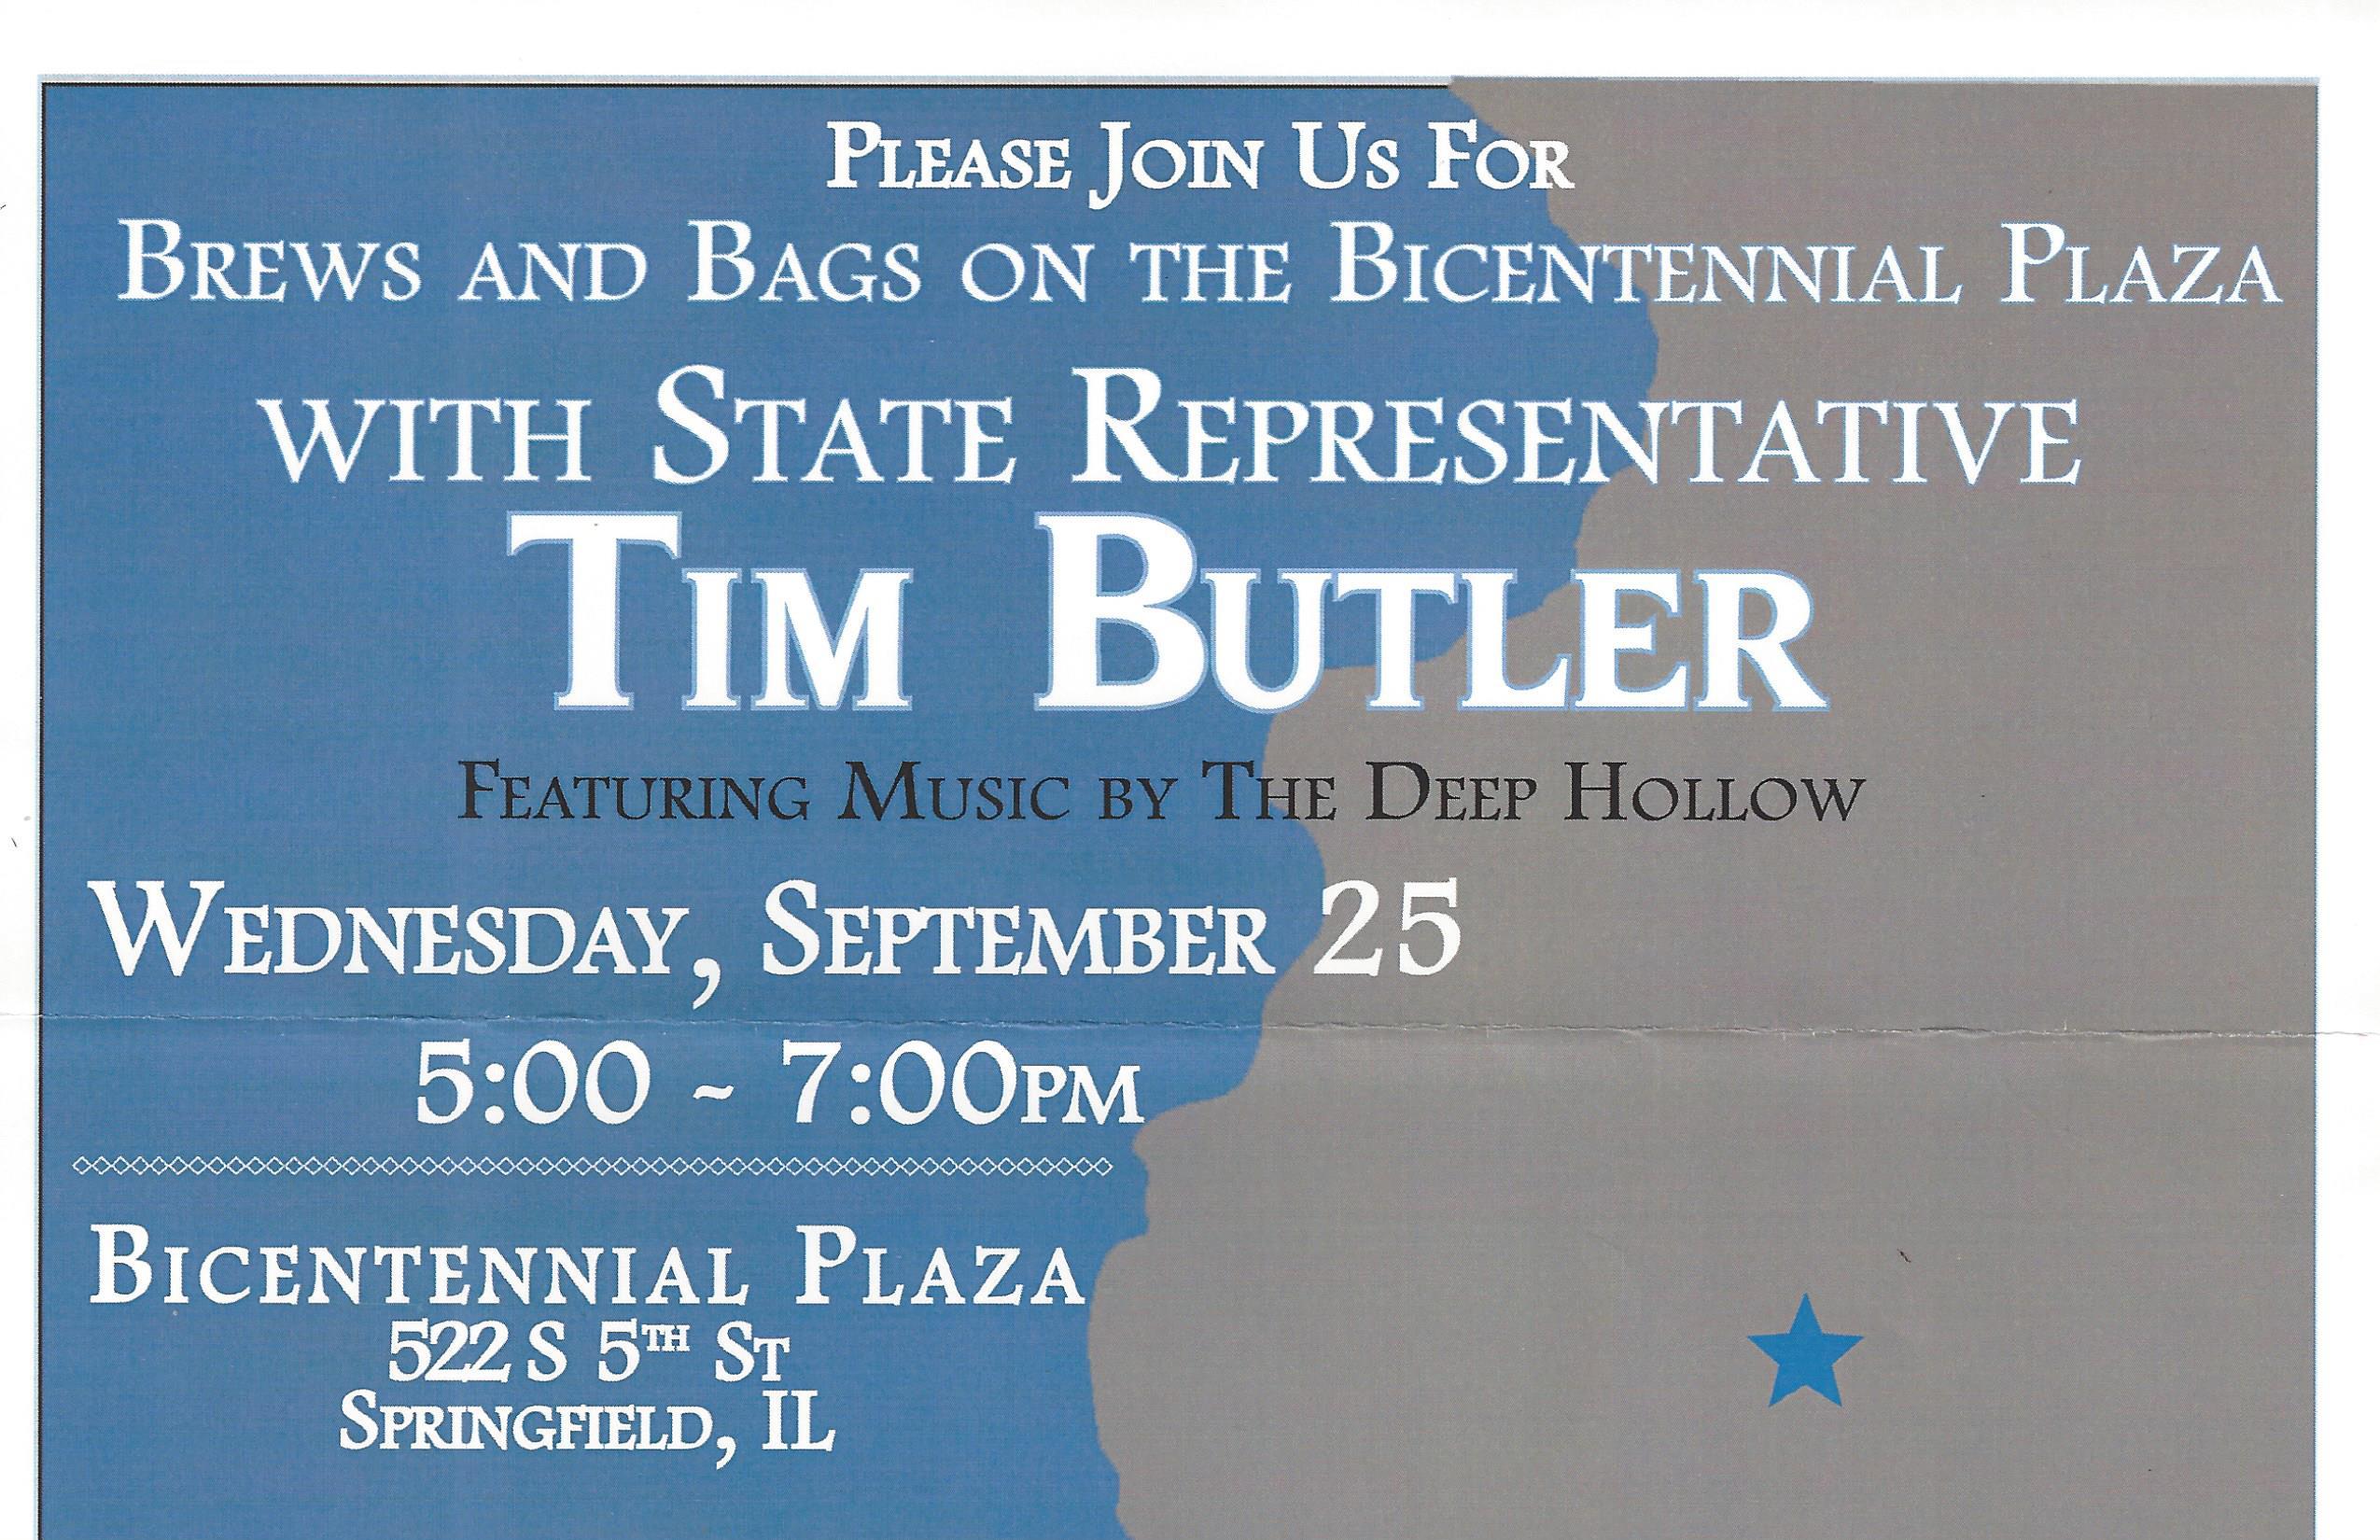 Tim Butler Brews & Bags at the Bicentennial Plaza